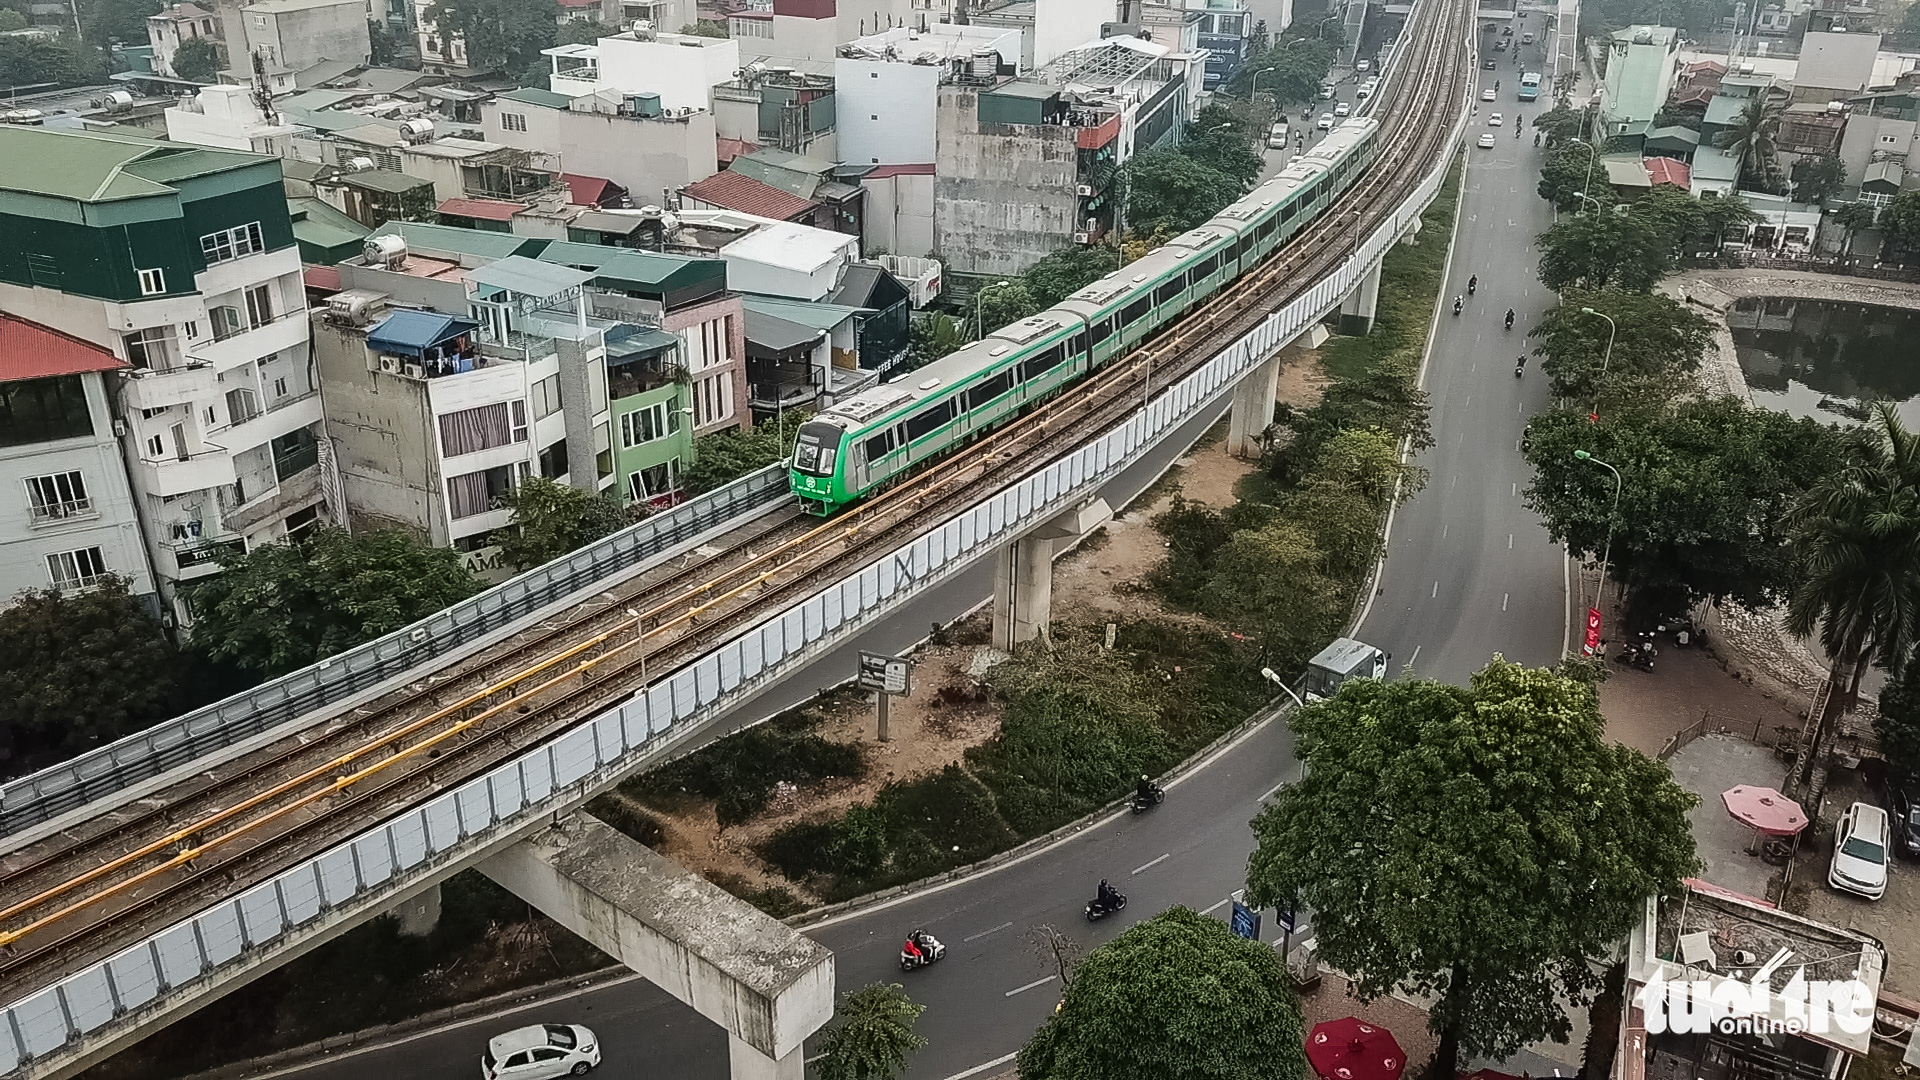 A train runs on the Cat Linh-Ha Dong urban railway line in Hanoi, December 12, 2020. Photo: Pham Tuan / Tuoi Tre